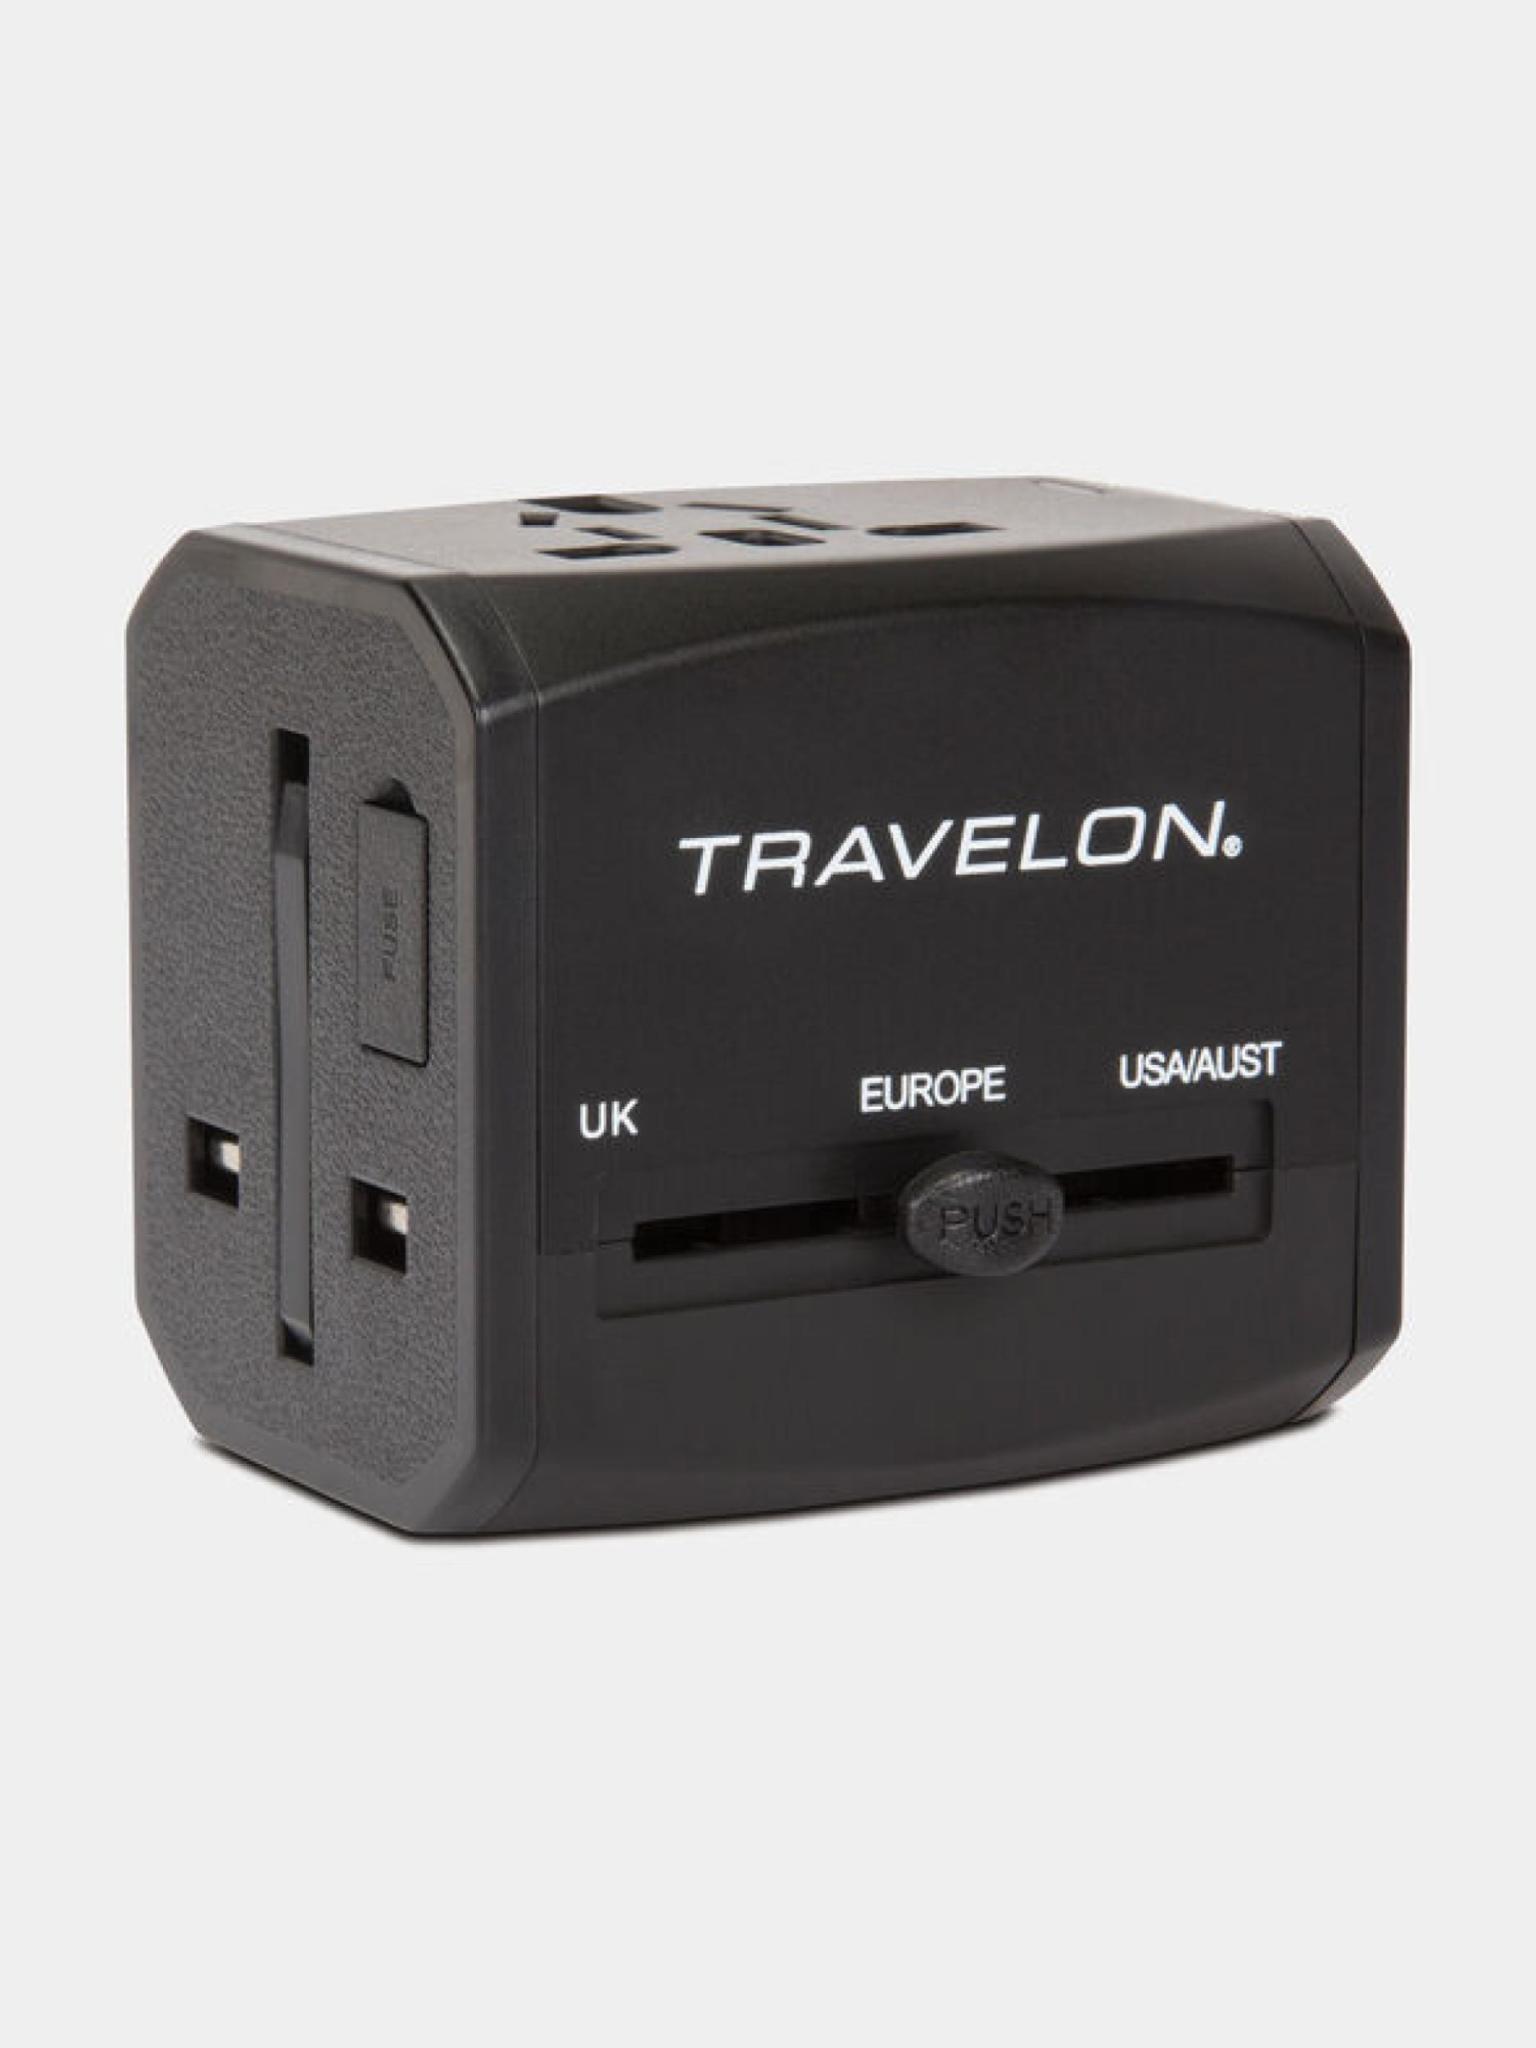 Travelon USB Universal Power Adapter Type C